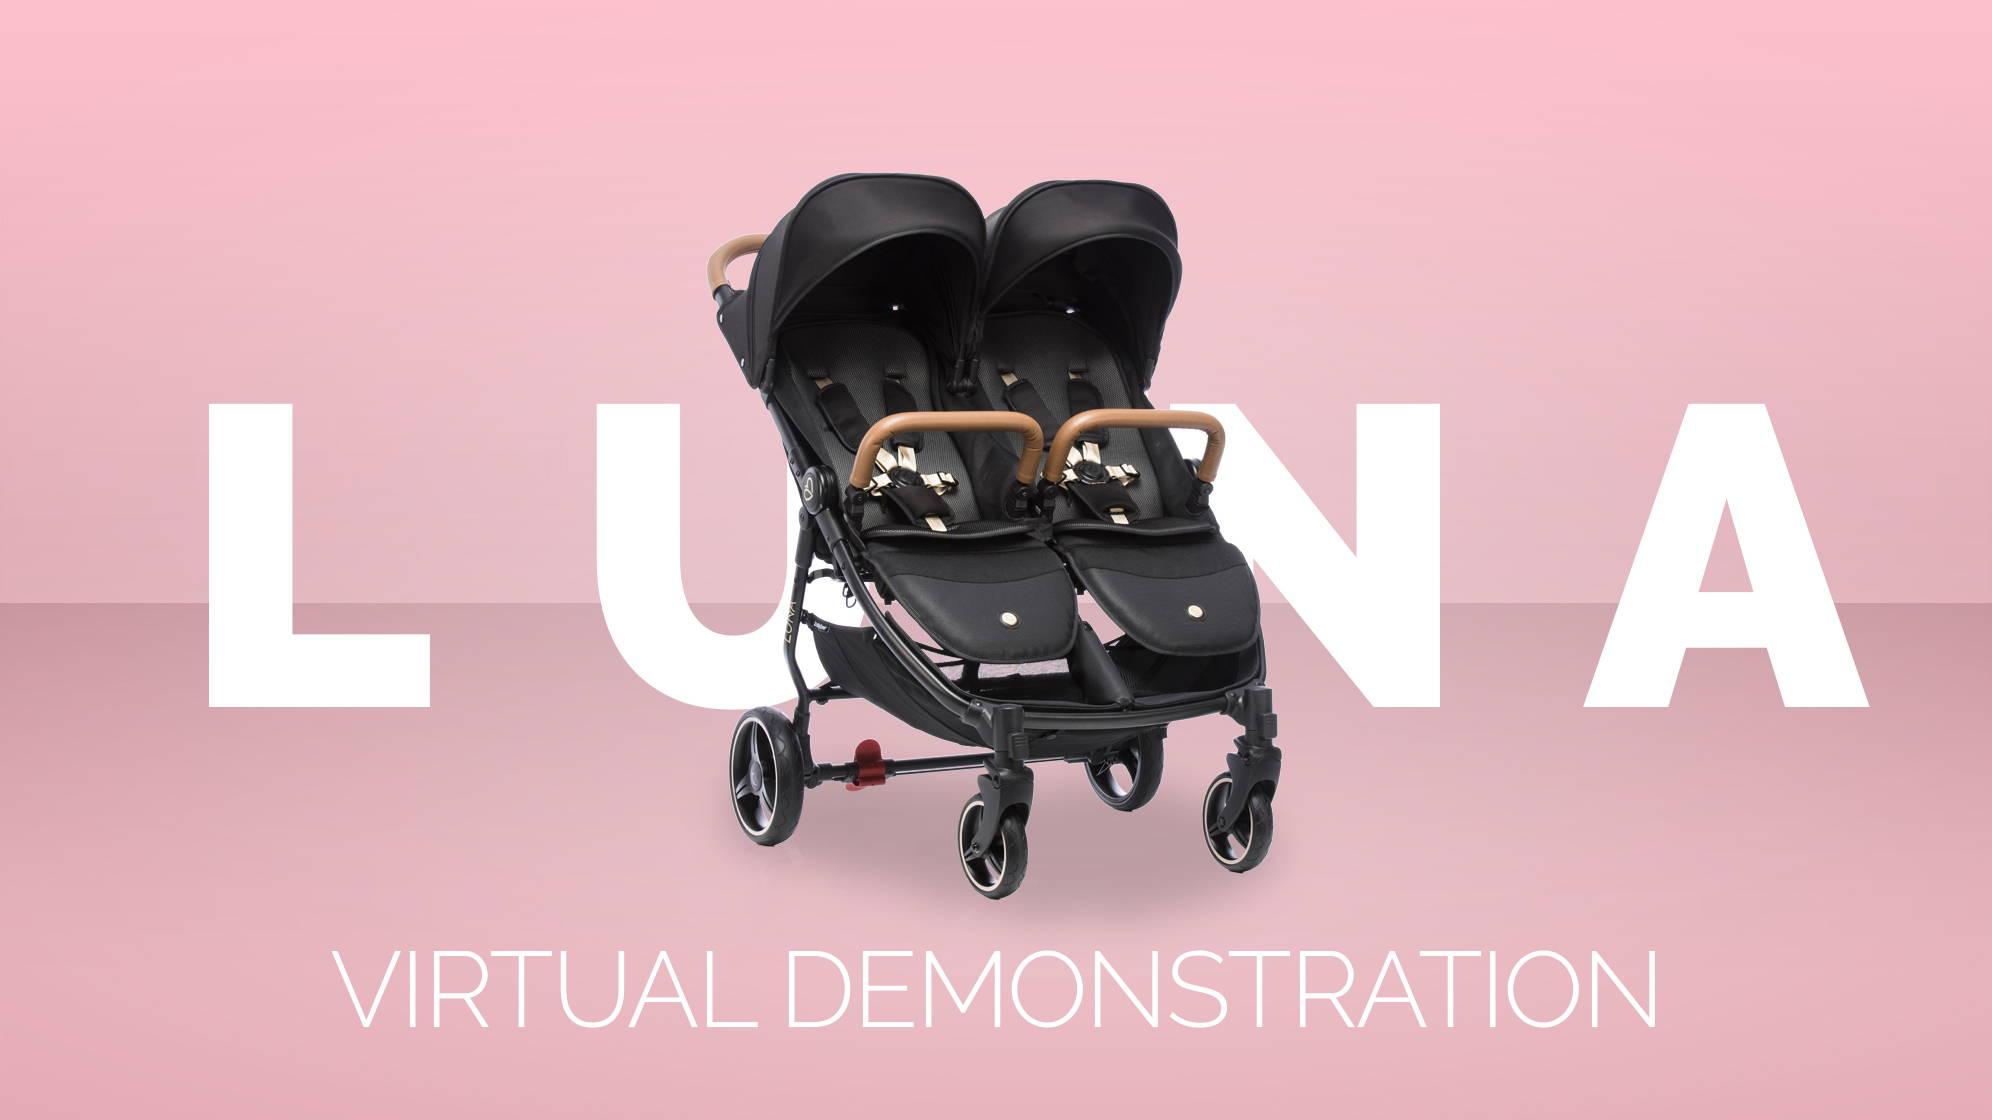 Babybee LUNA Virtual Demonstration